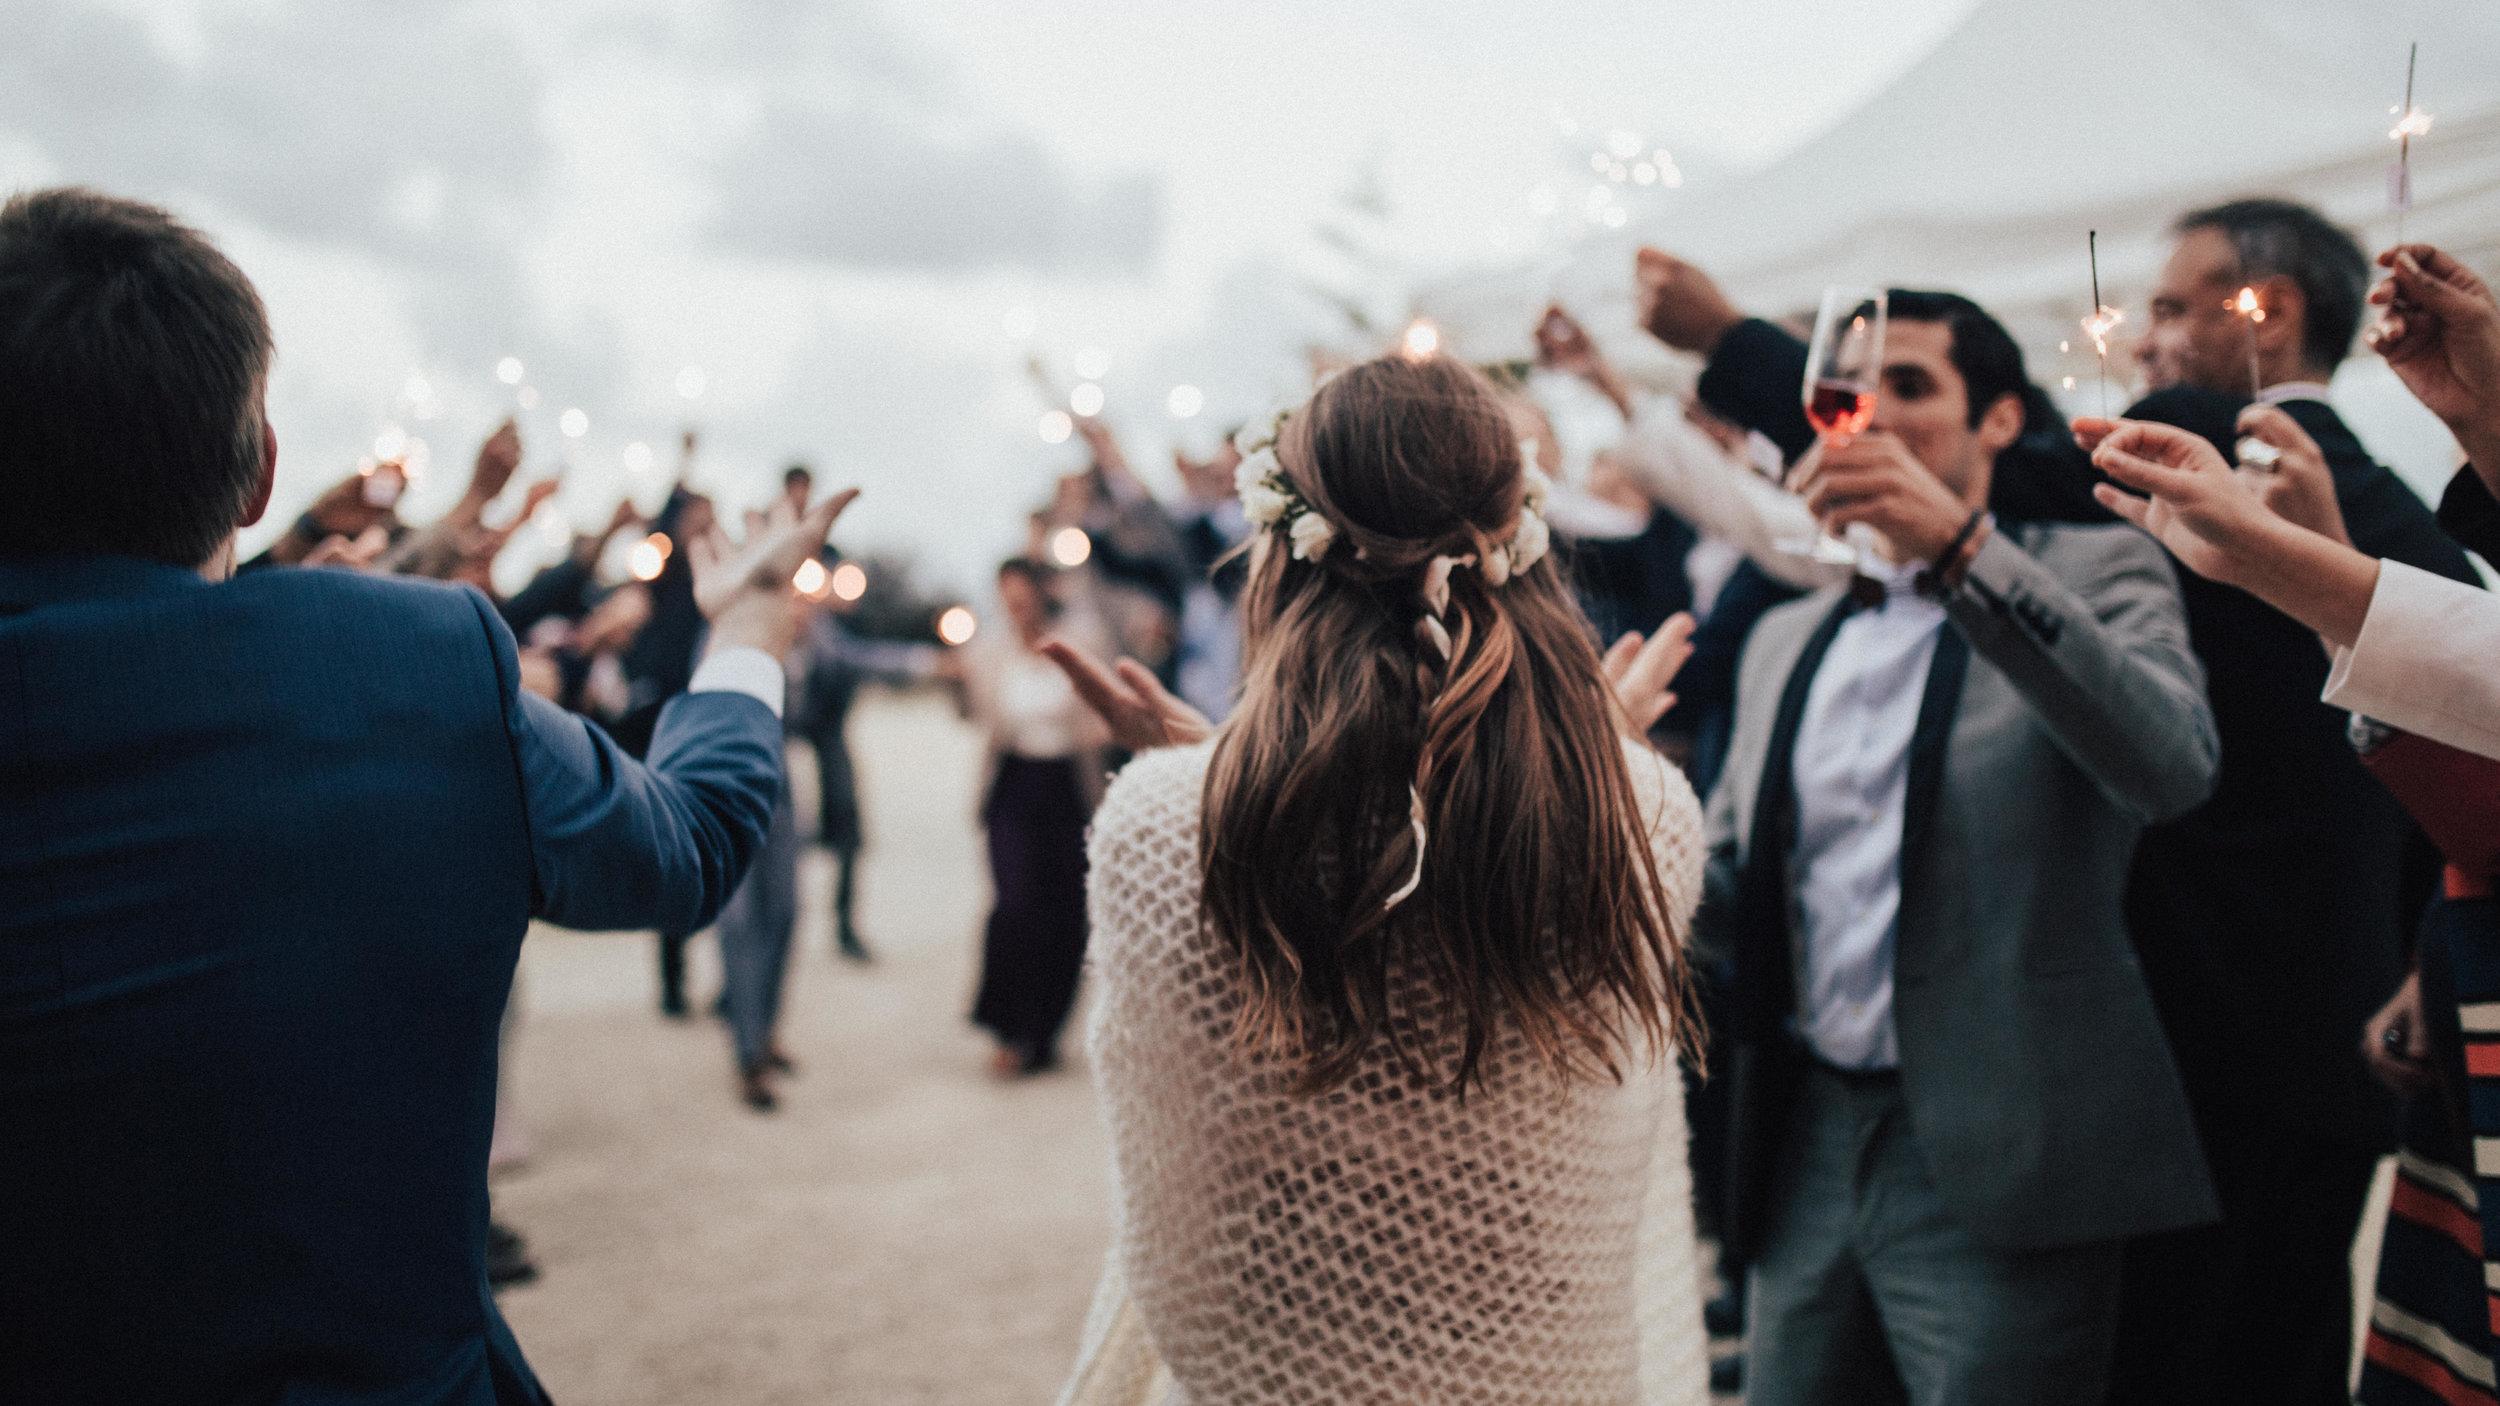 Bartending Services for Weddings